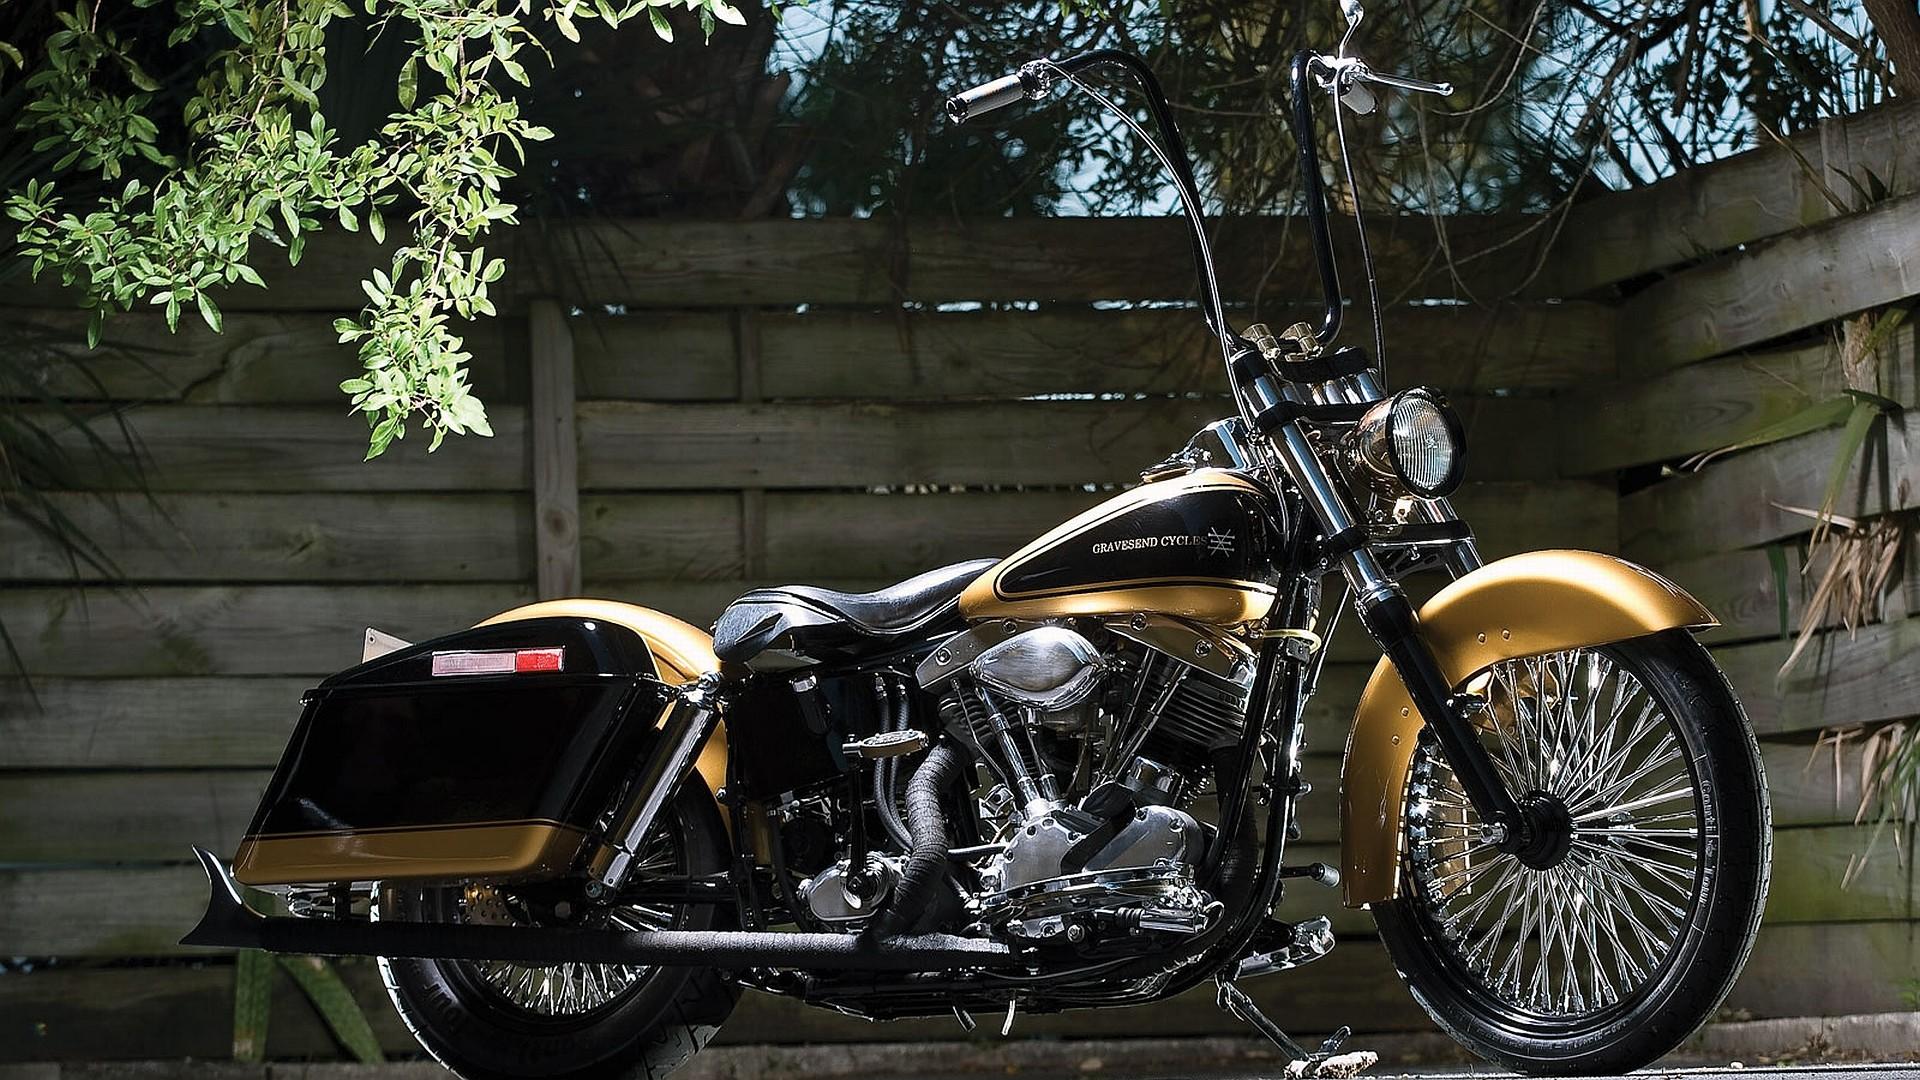 Hd Harley Davidson Wallpapers 77 Images